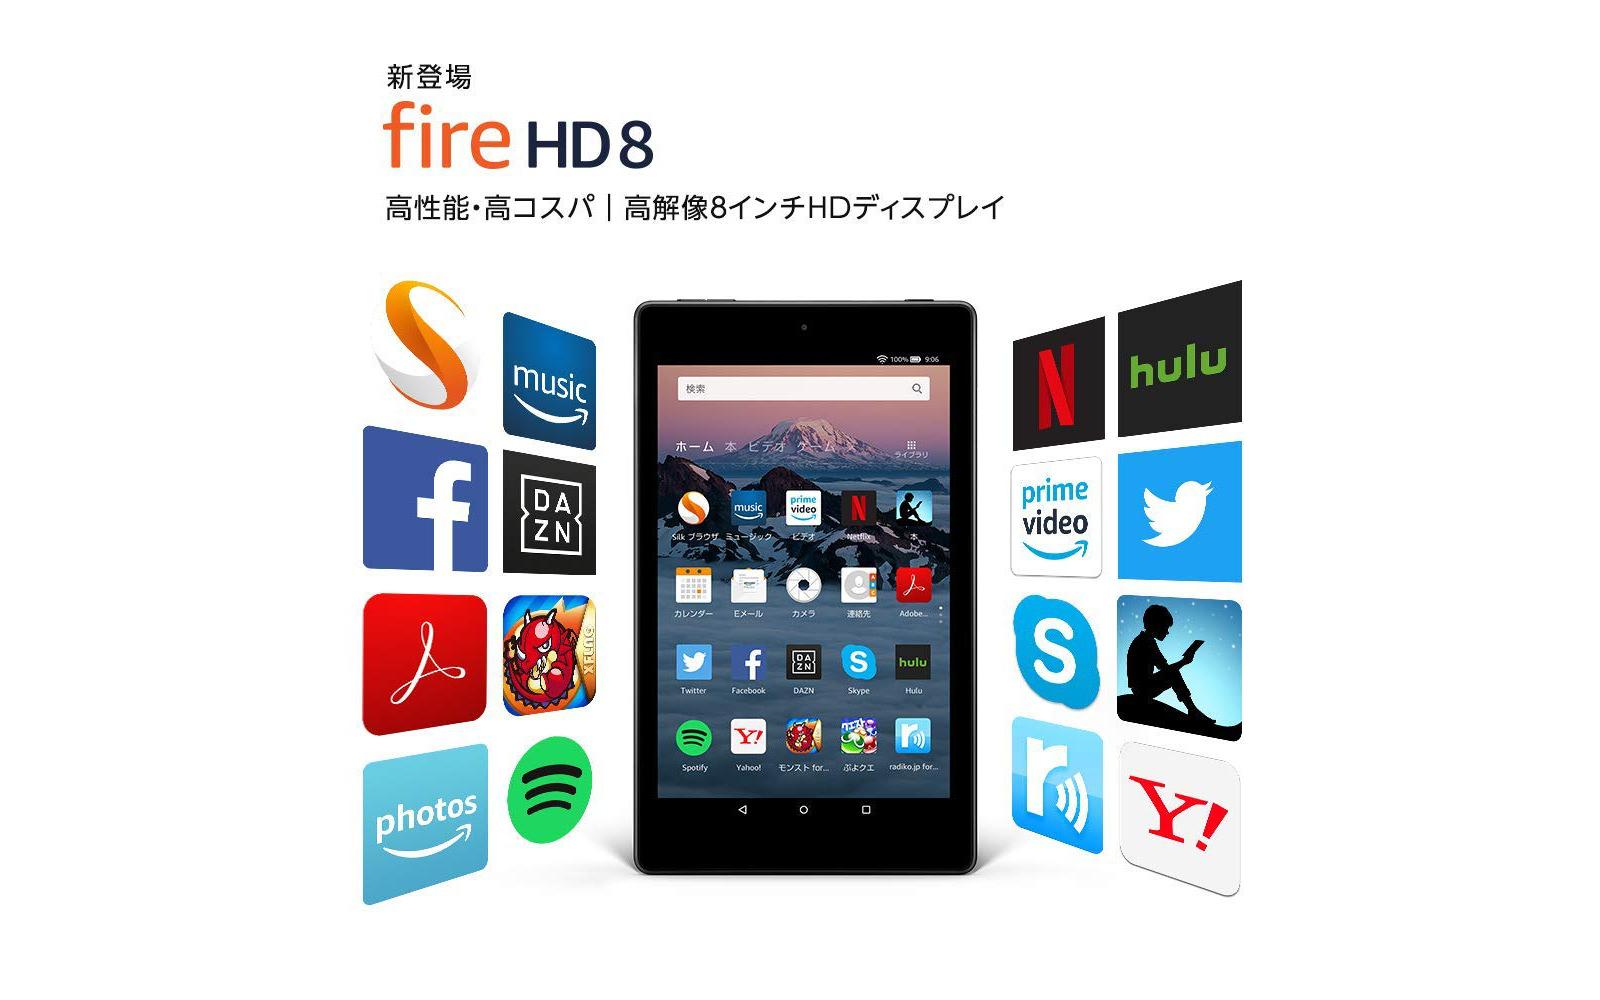 New-Fire-HD-8-tablet.jpg